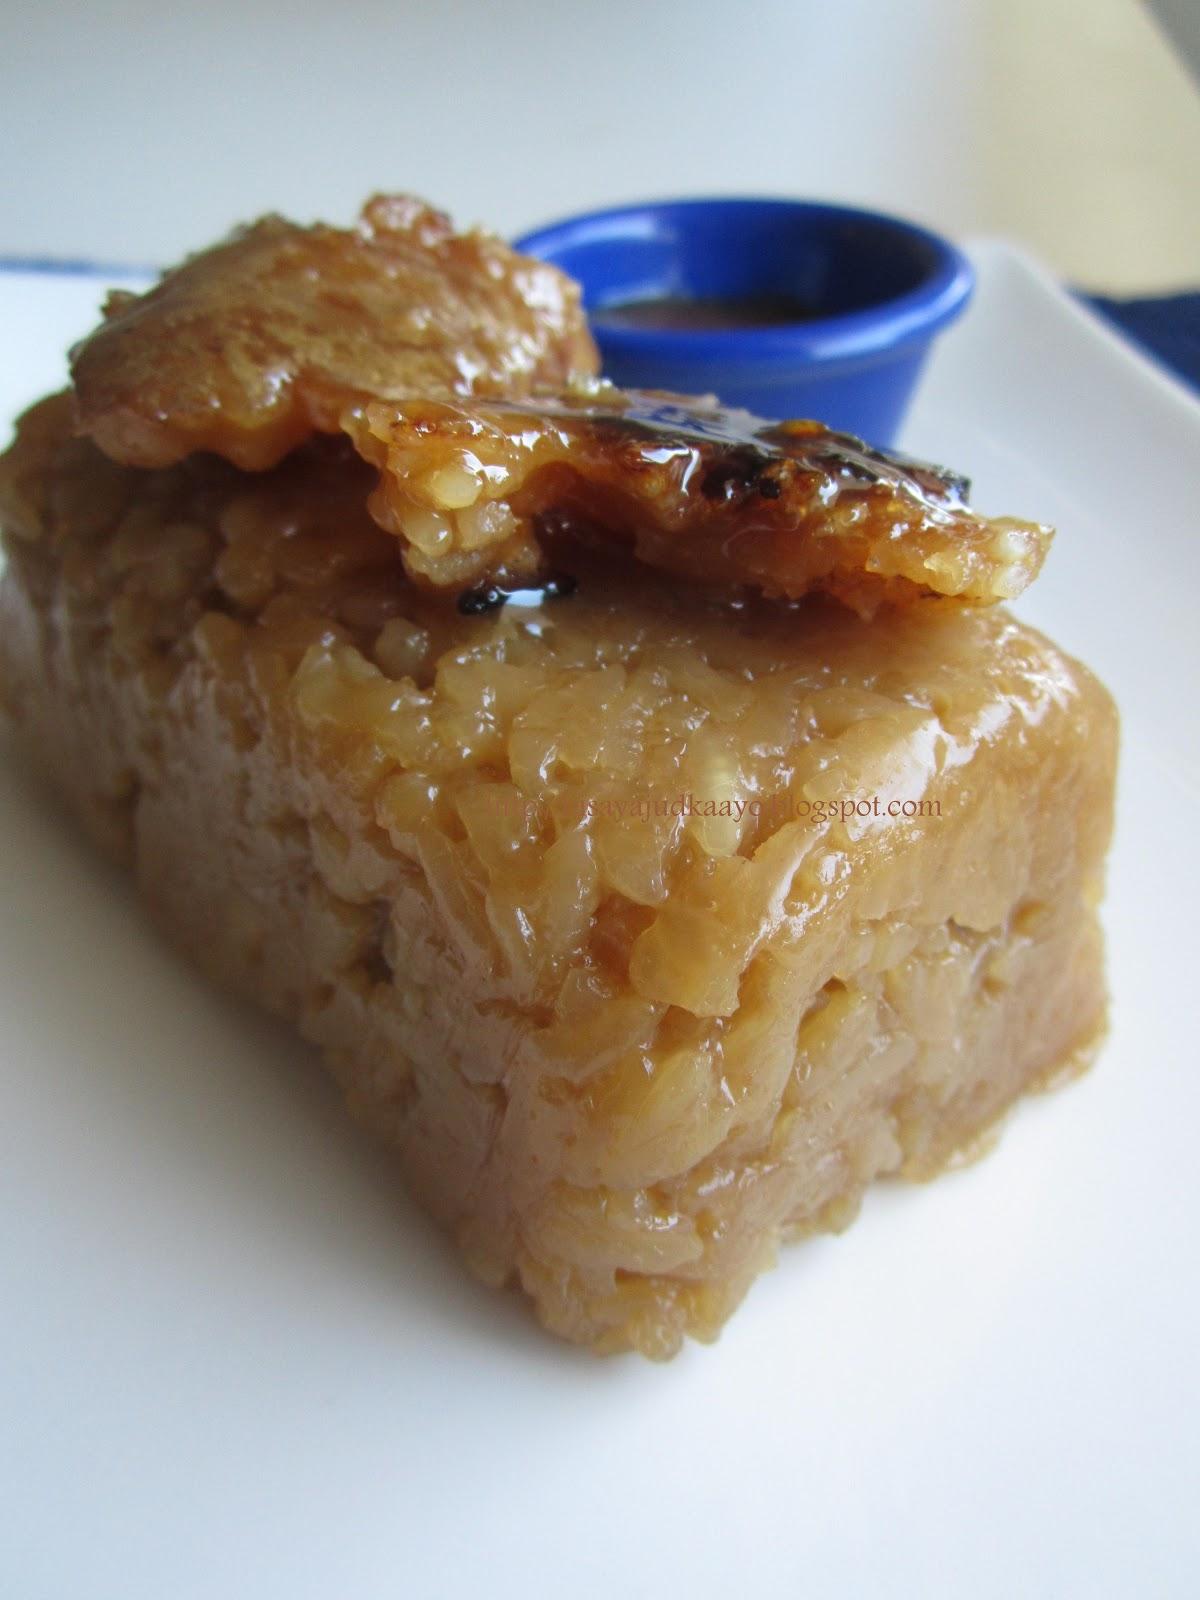 Inato lang Filipino Cuisine and More: BIKO (SWEET RICE